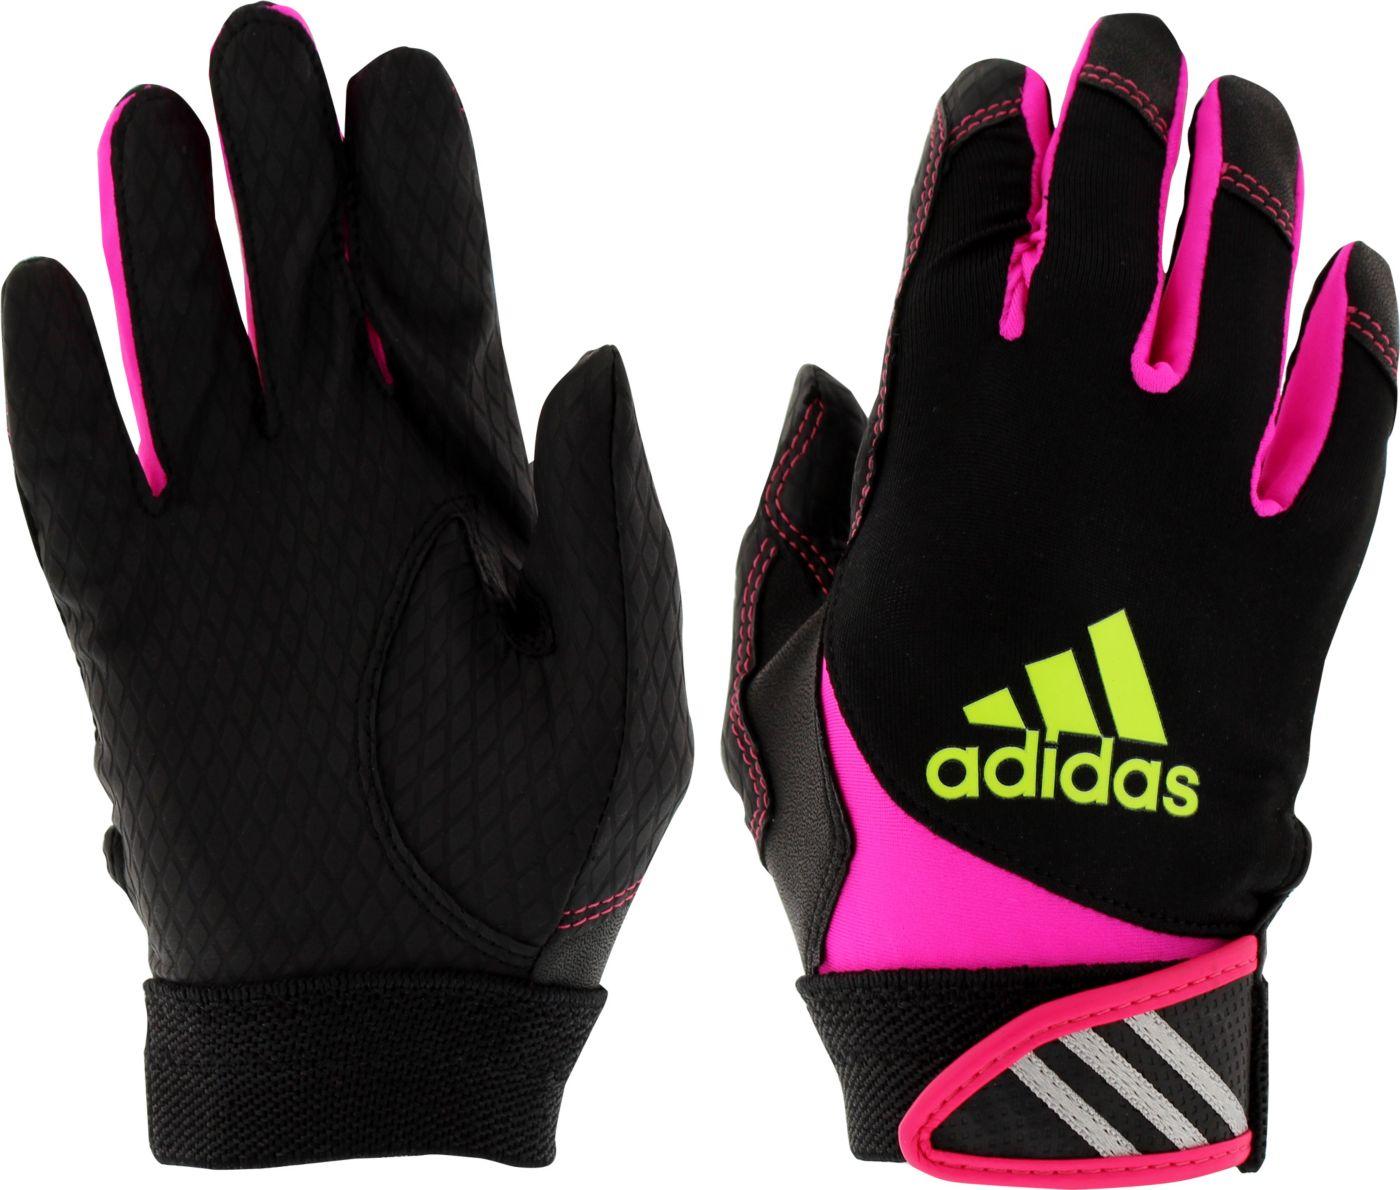 adidas Girls' T-Ball Batting Gloves